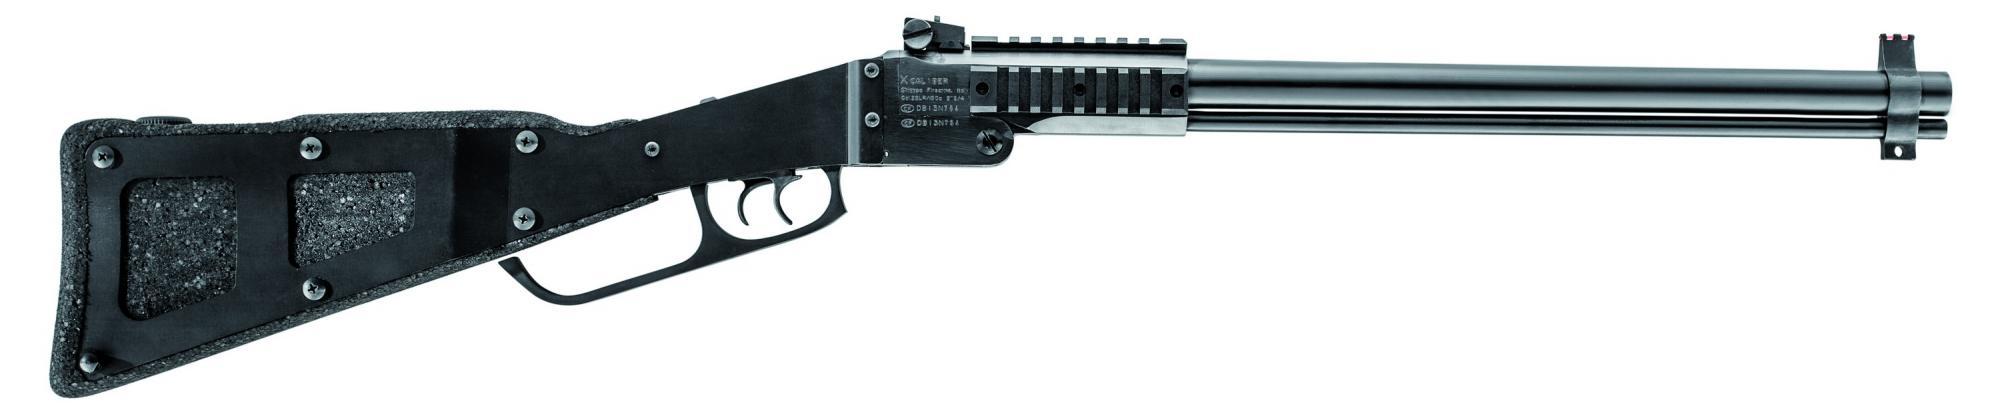 CJ515